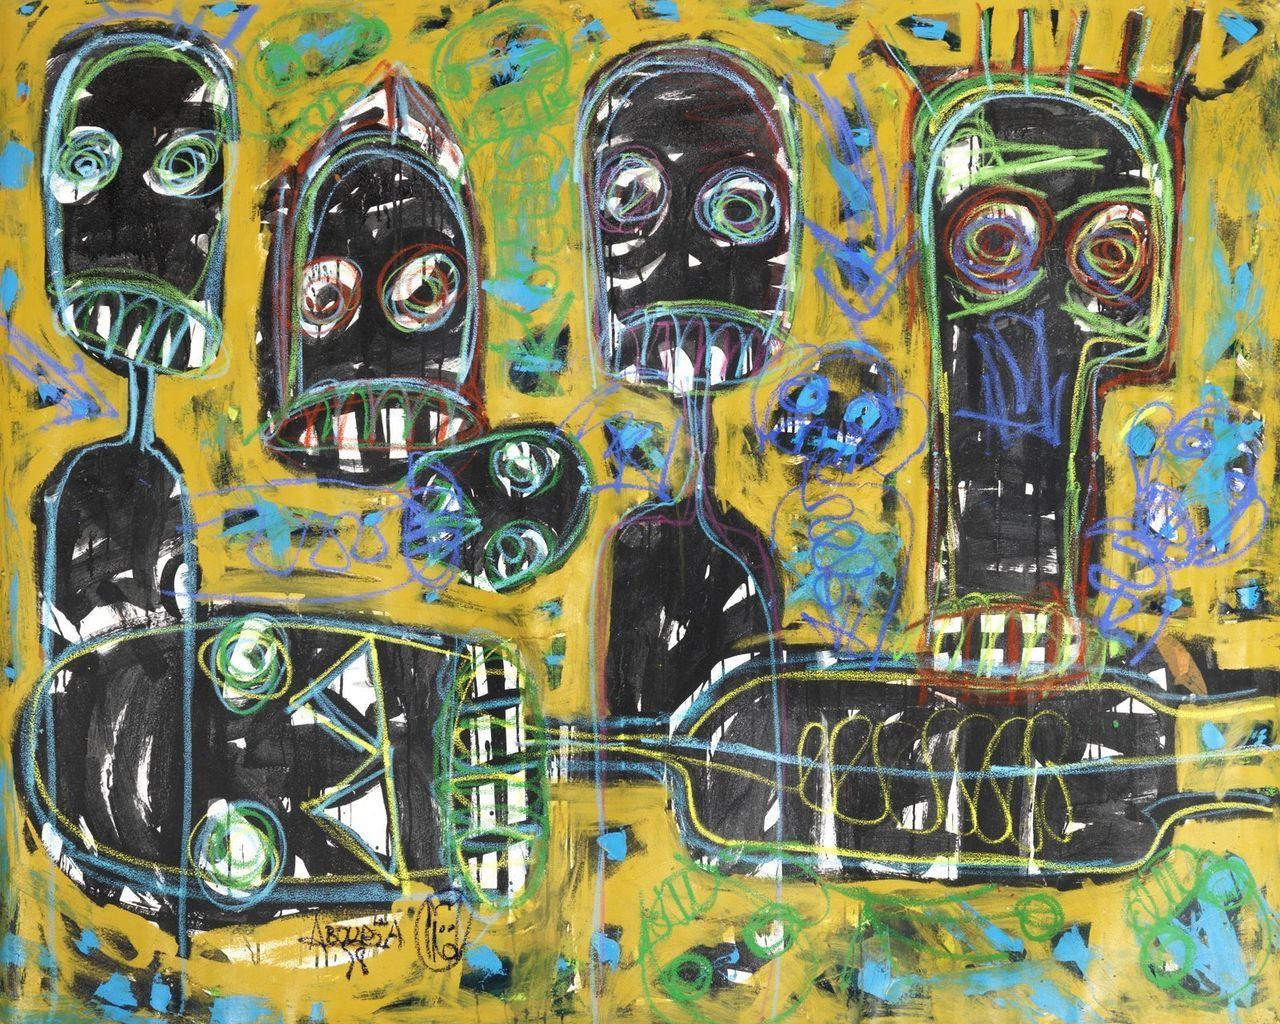 Untitled (2014), Aboudia Abdoulaye Diarrassouba